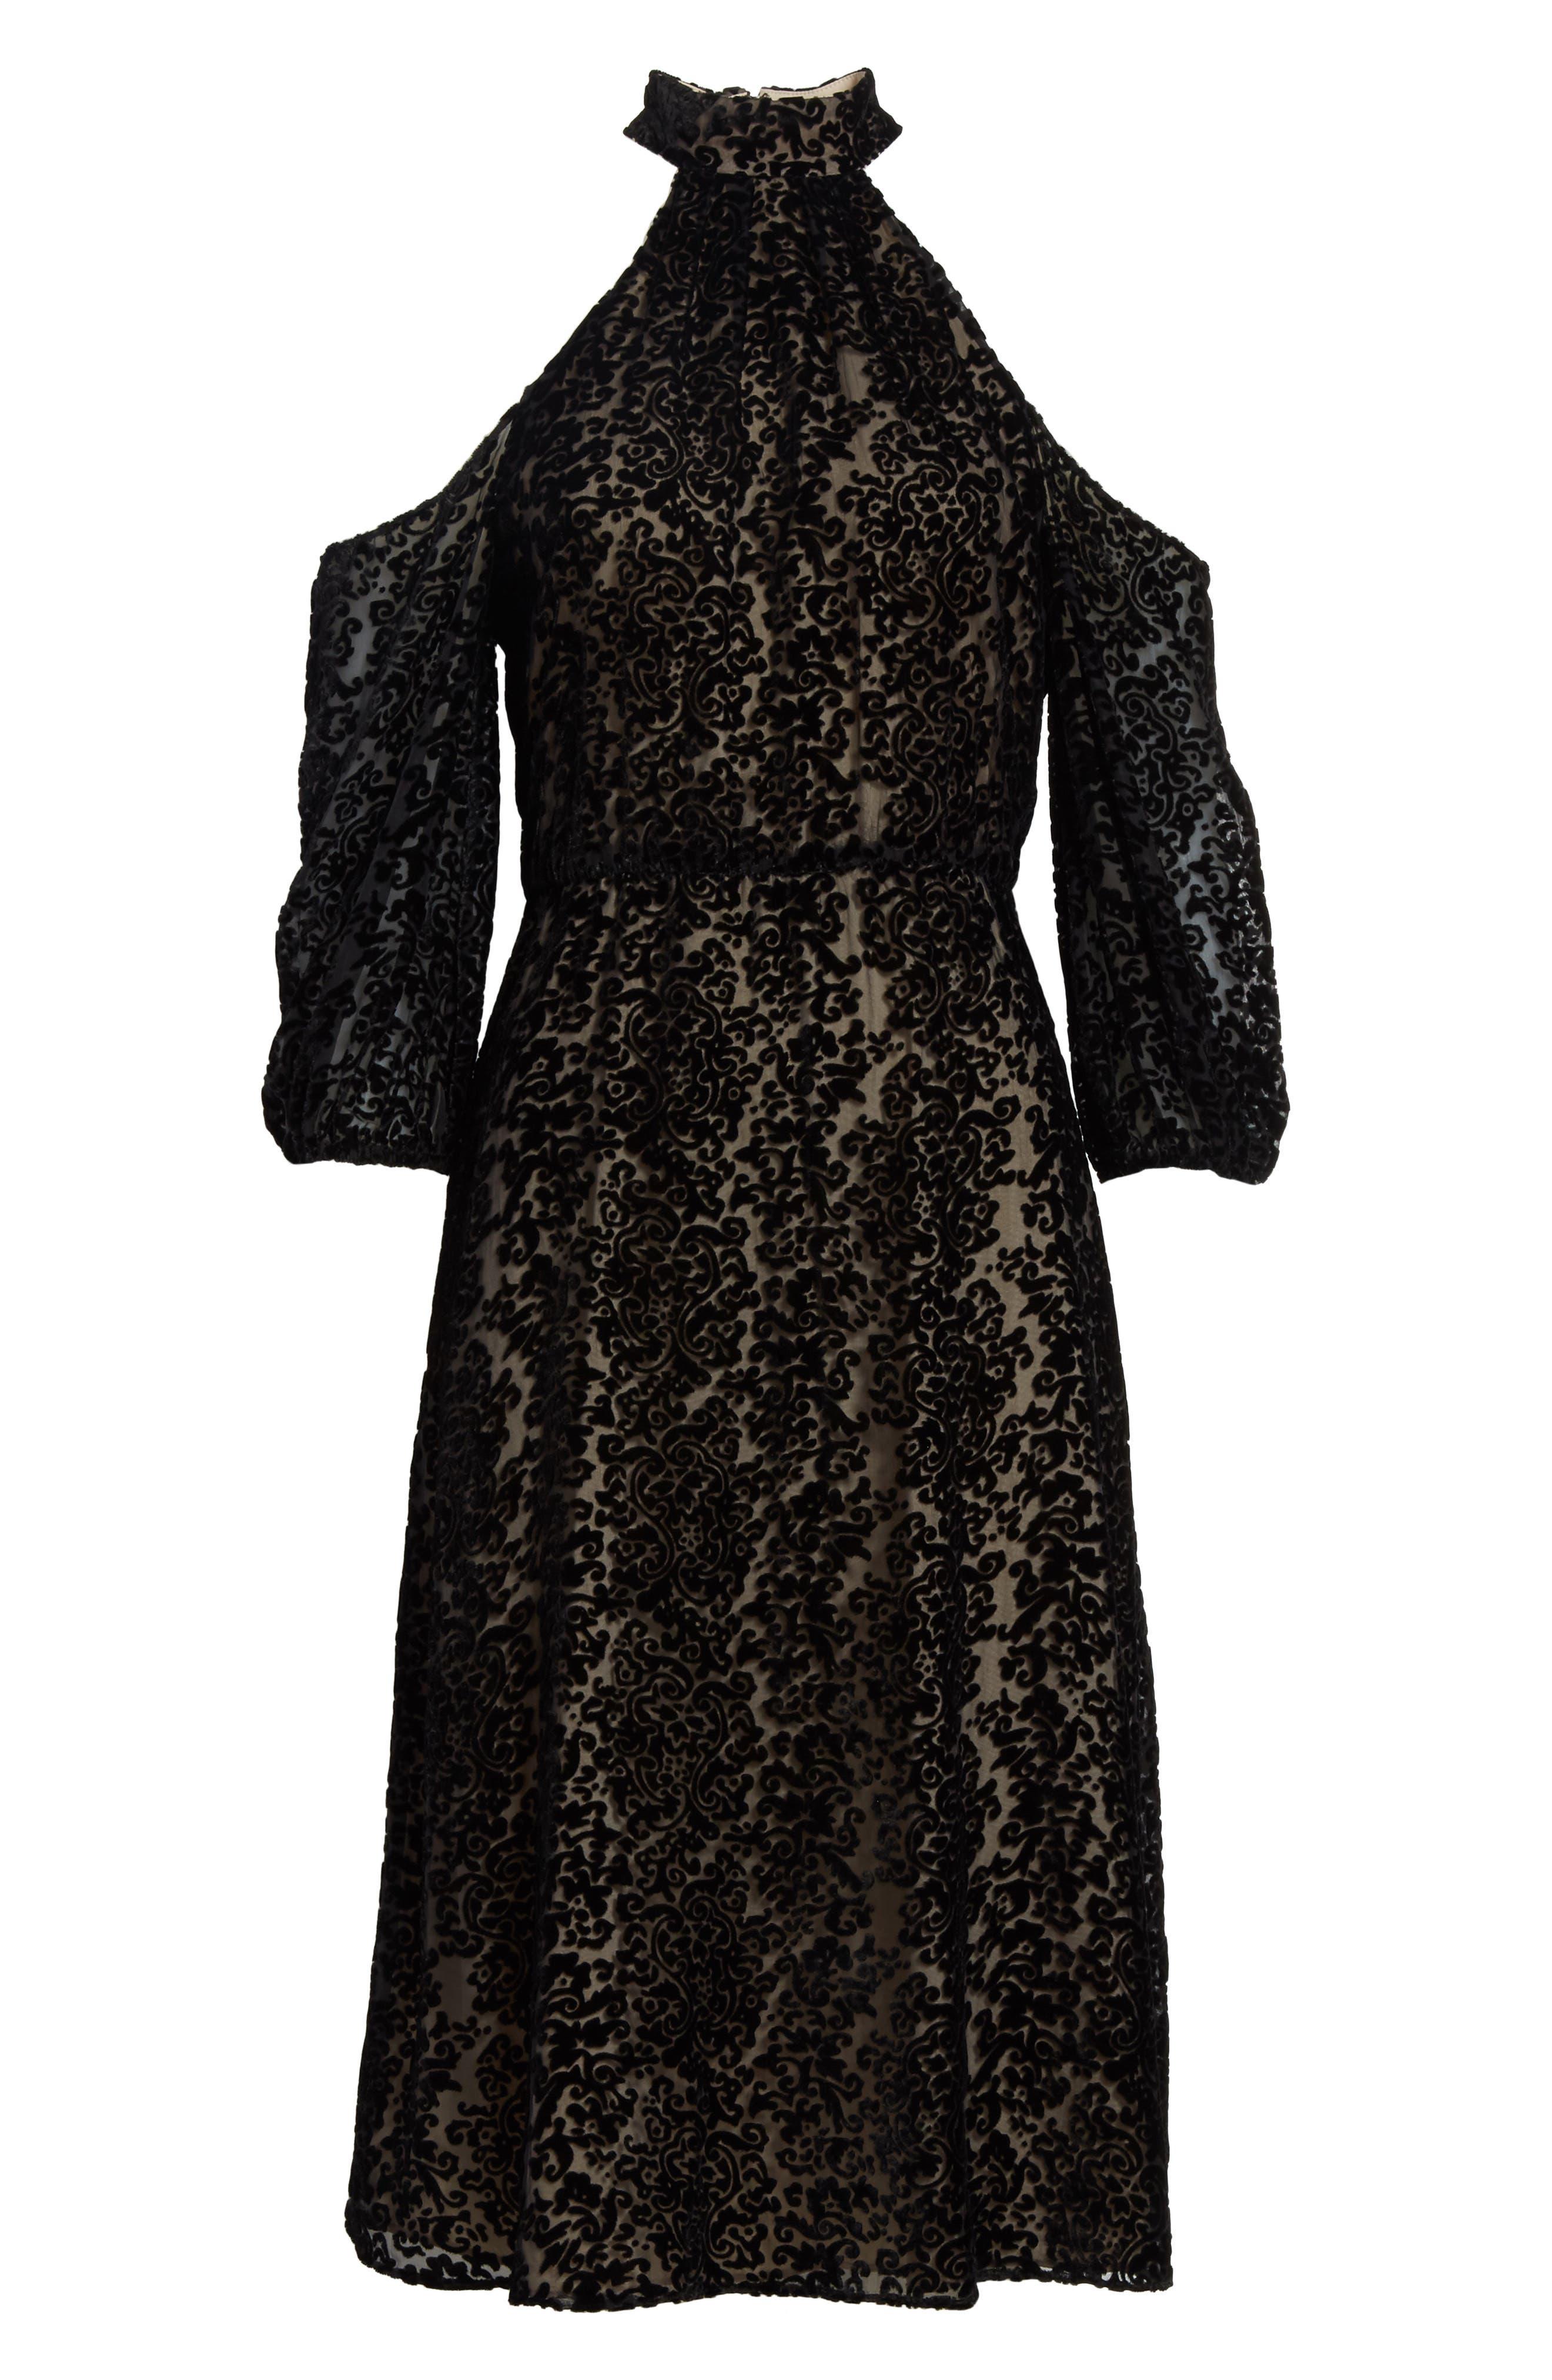 Ruthann Cold Shoulder Burnout Velvet Dress,                             Alternate thumbnail 6, color,                             001